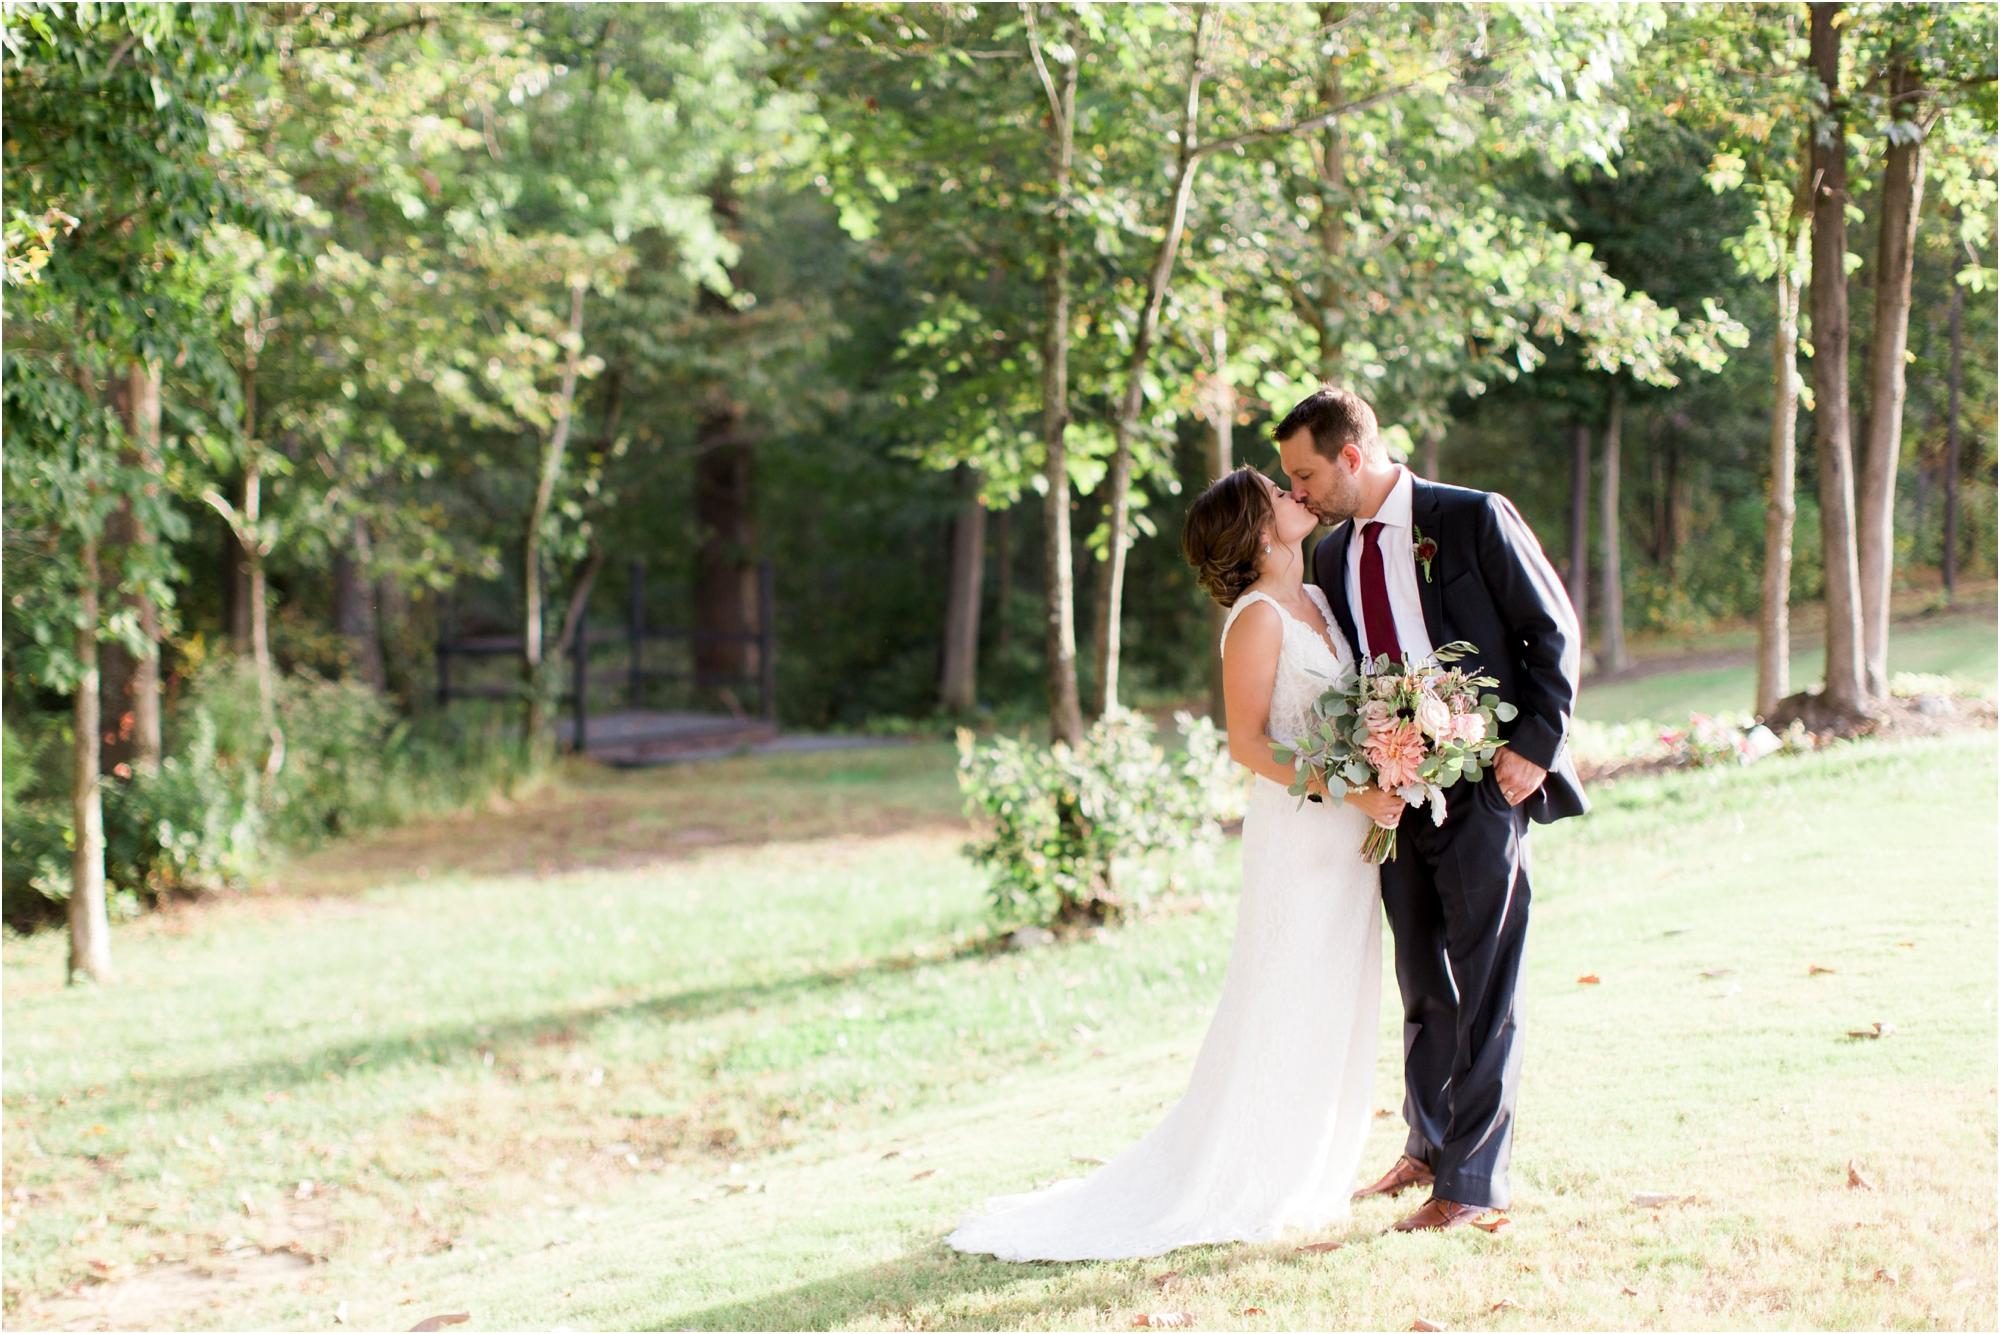 brittany-brad-ashton-creek-vineyard-richmond-virginia-wedding_0038.jpg